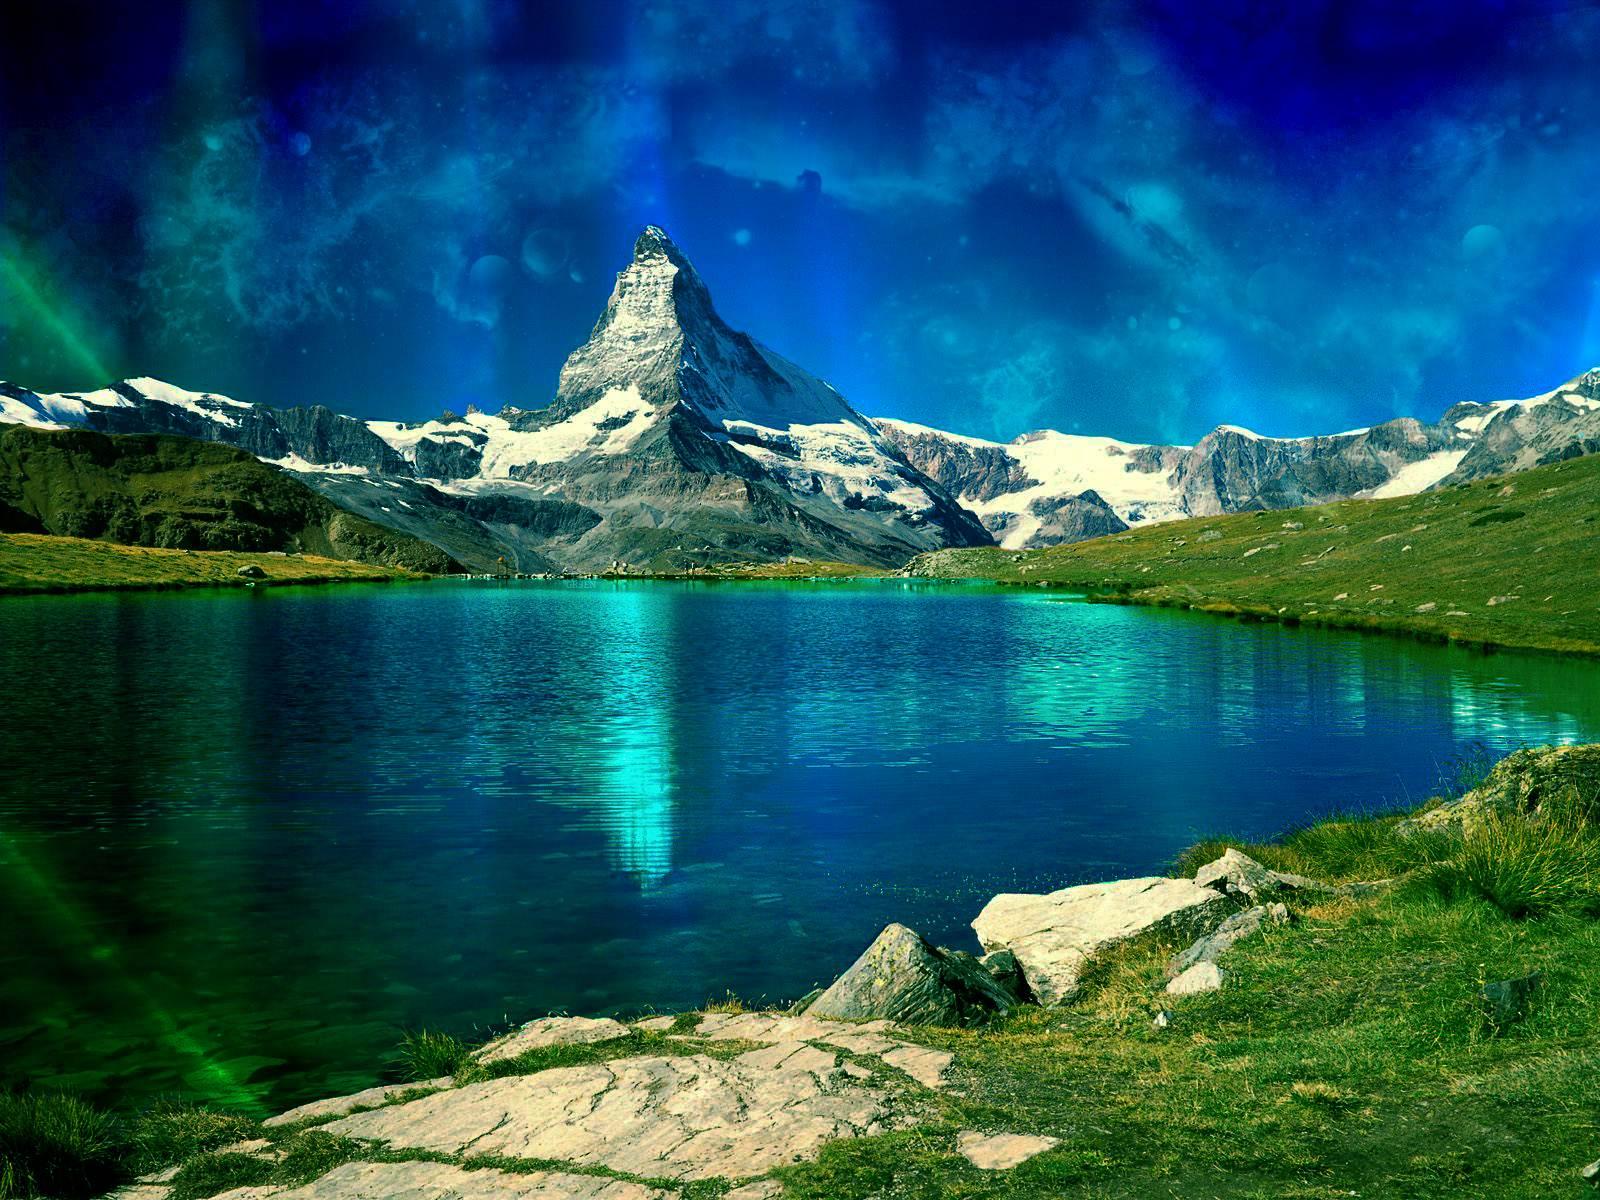 http://4.bp.blogspot.com/_XF_J0xP6x-w/TVAMtTy7esI/AAAAAAAAA2Q/sIxvQtt3q98/s1600/wallpaper-paisaje-monta%25C3%25B1as.jpg